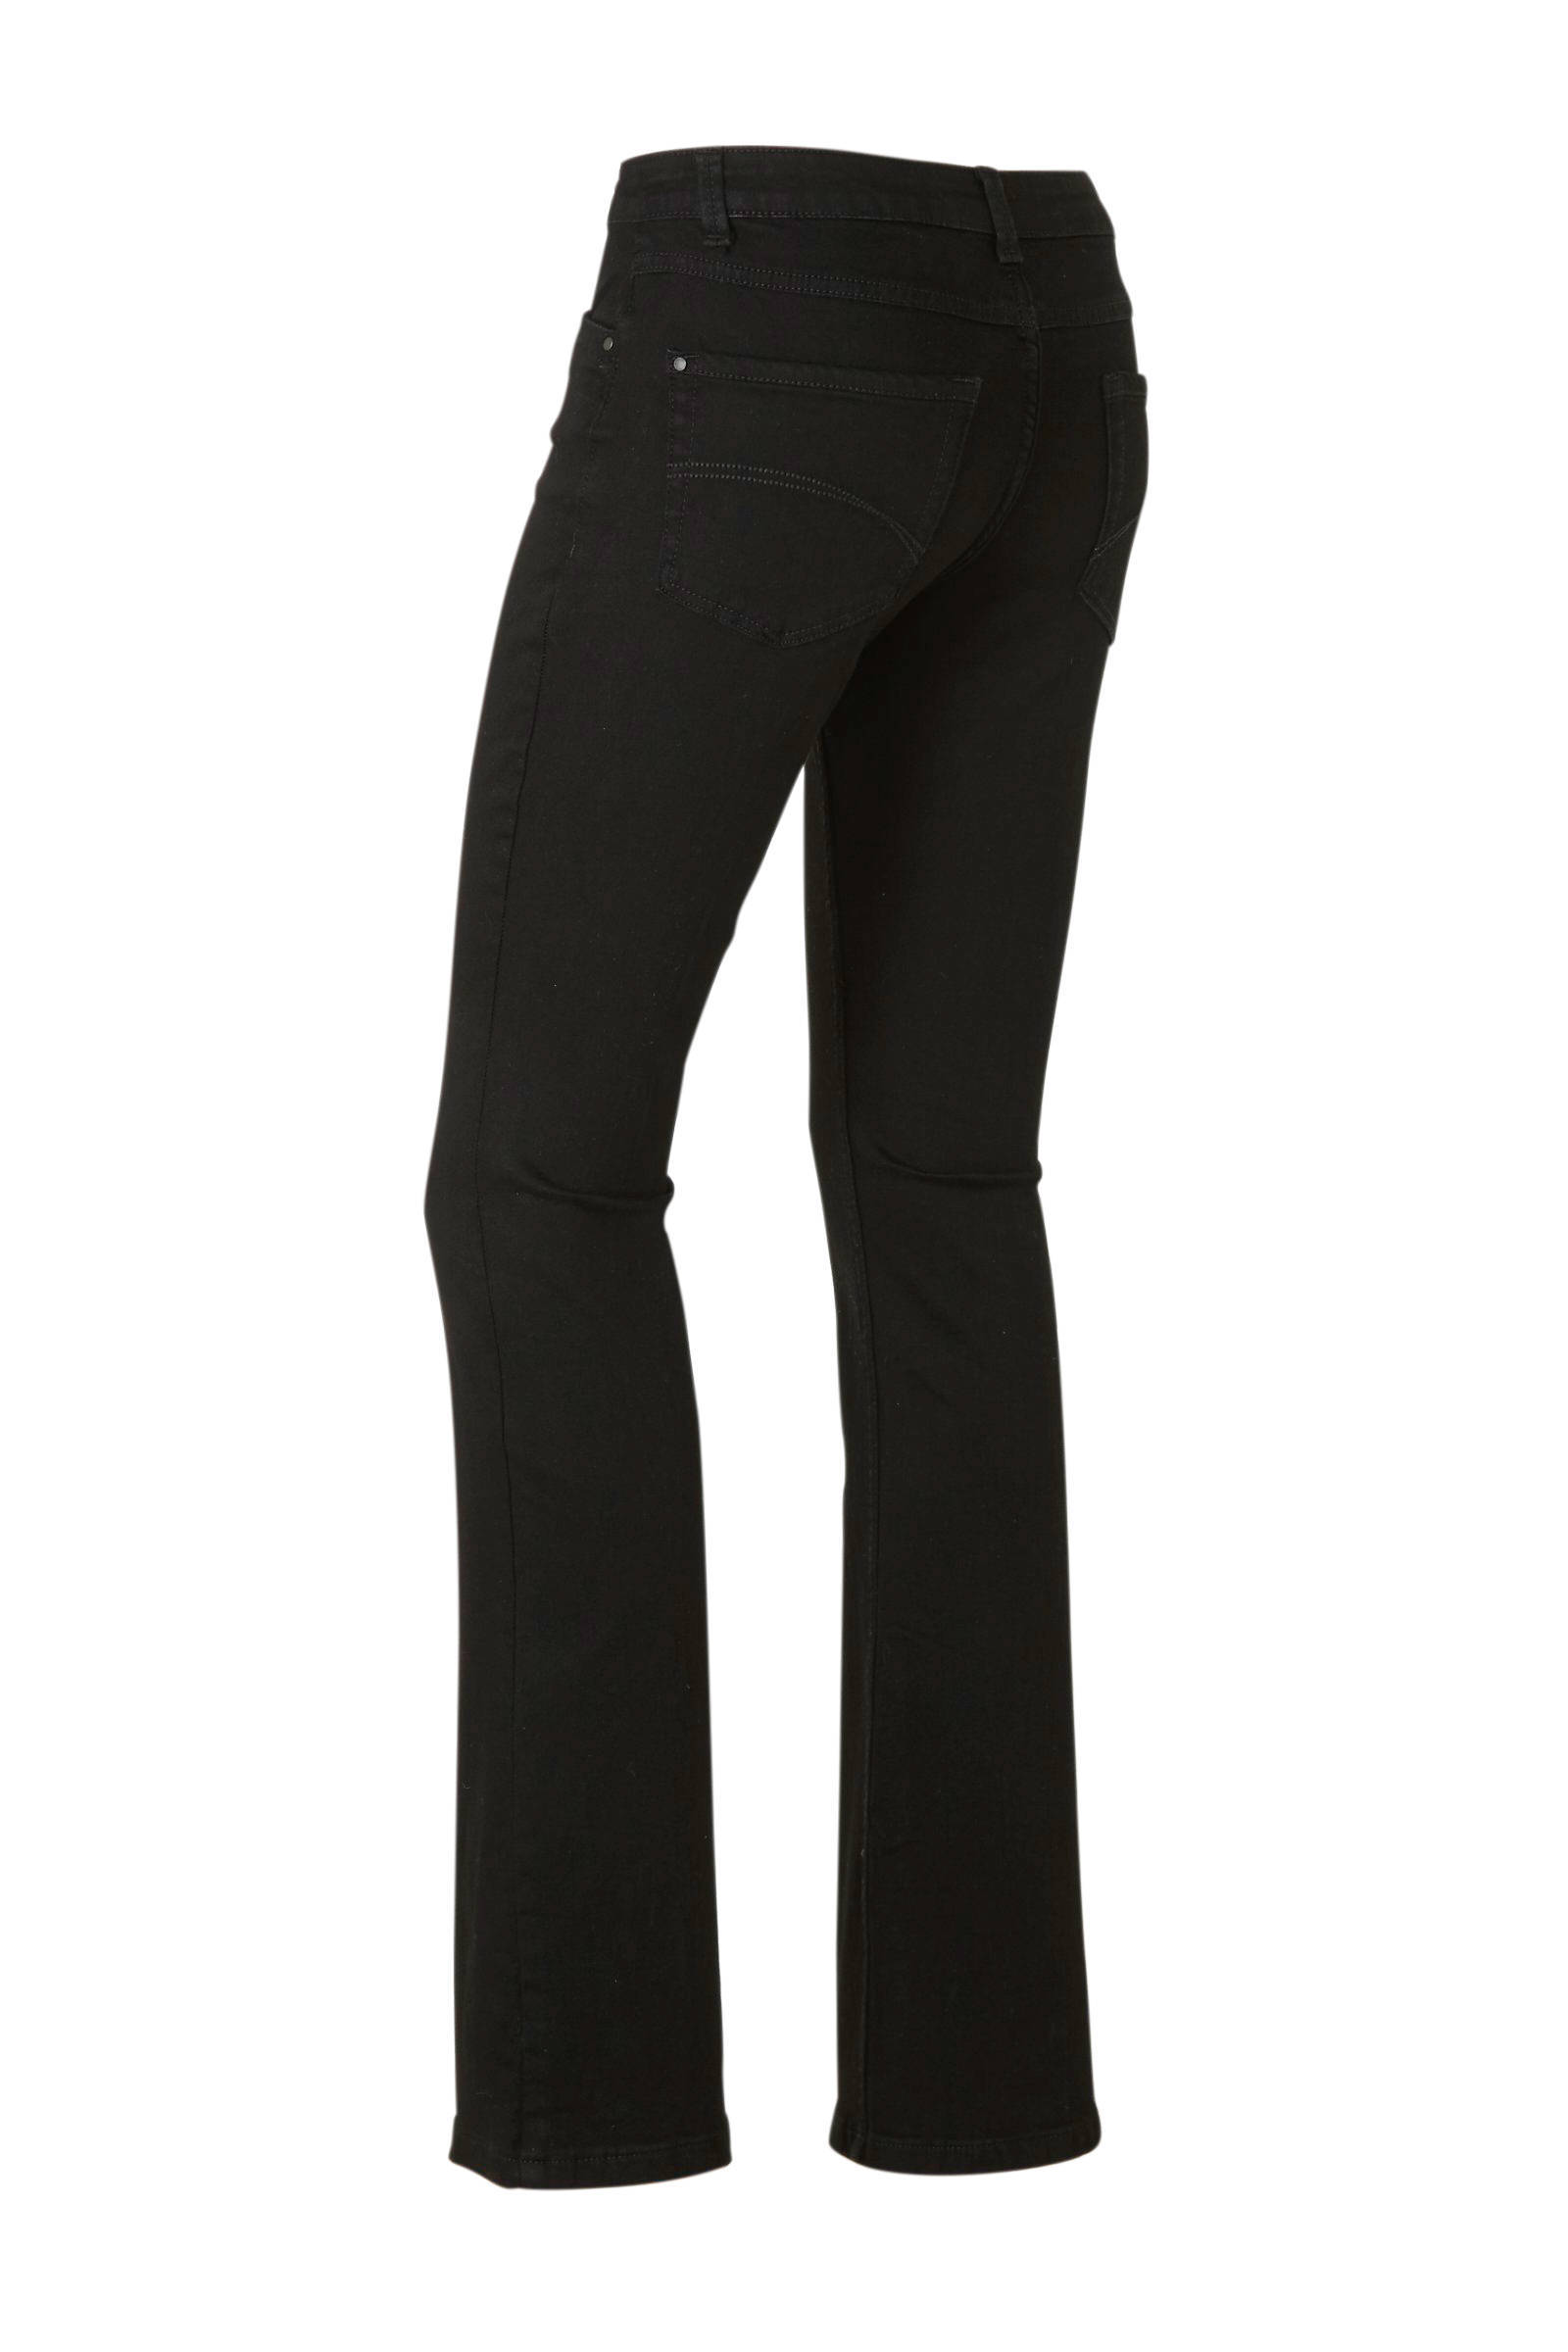 C&A The Denim bootcut jeans